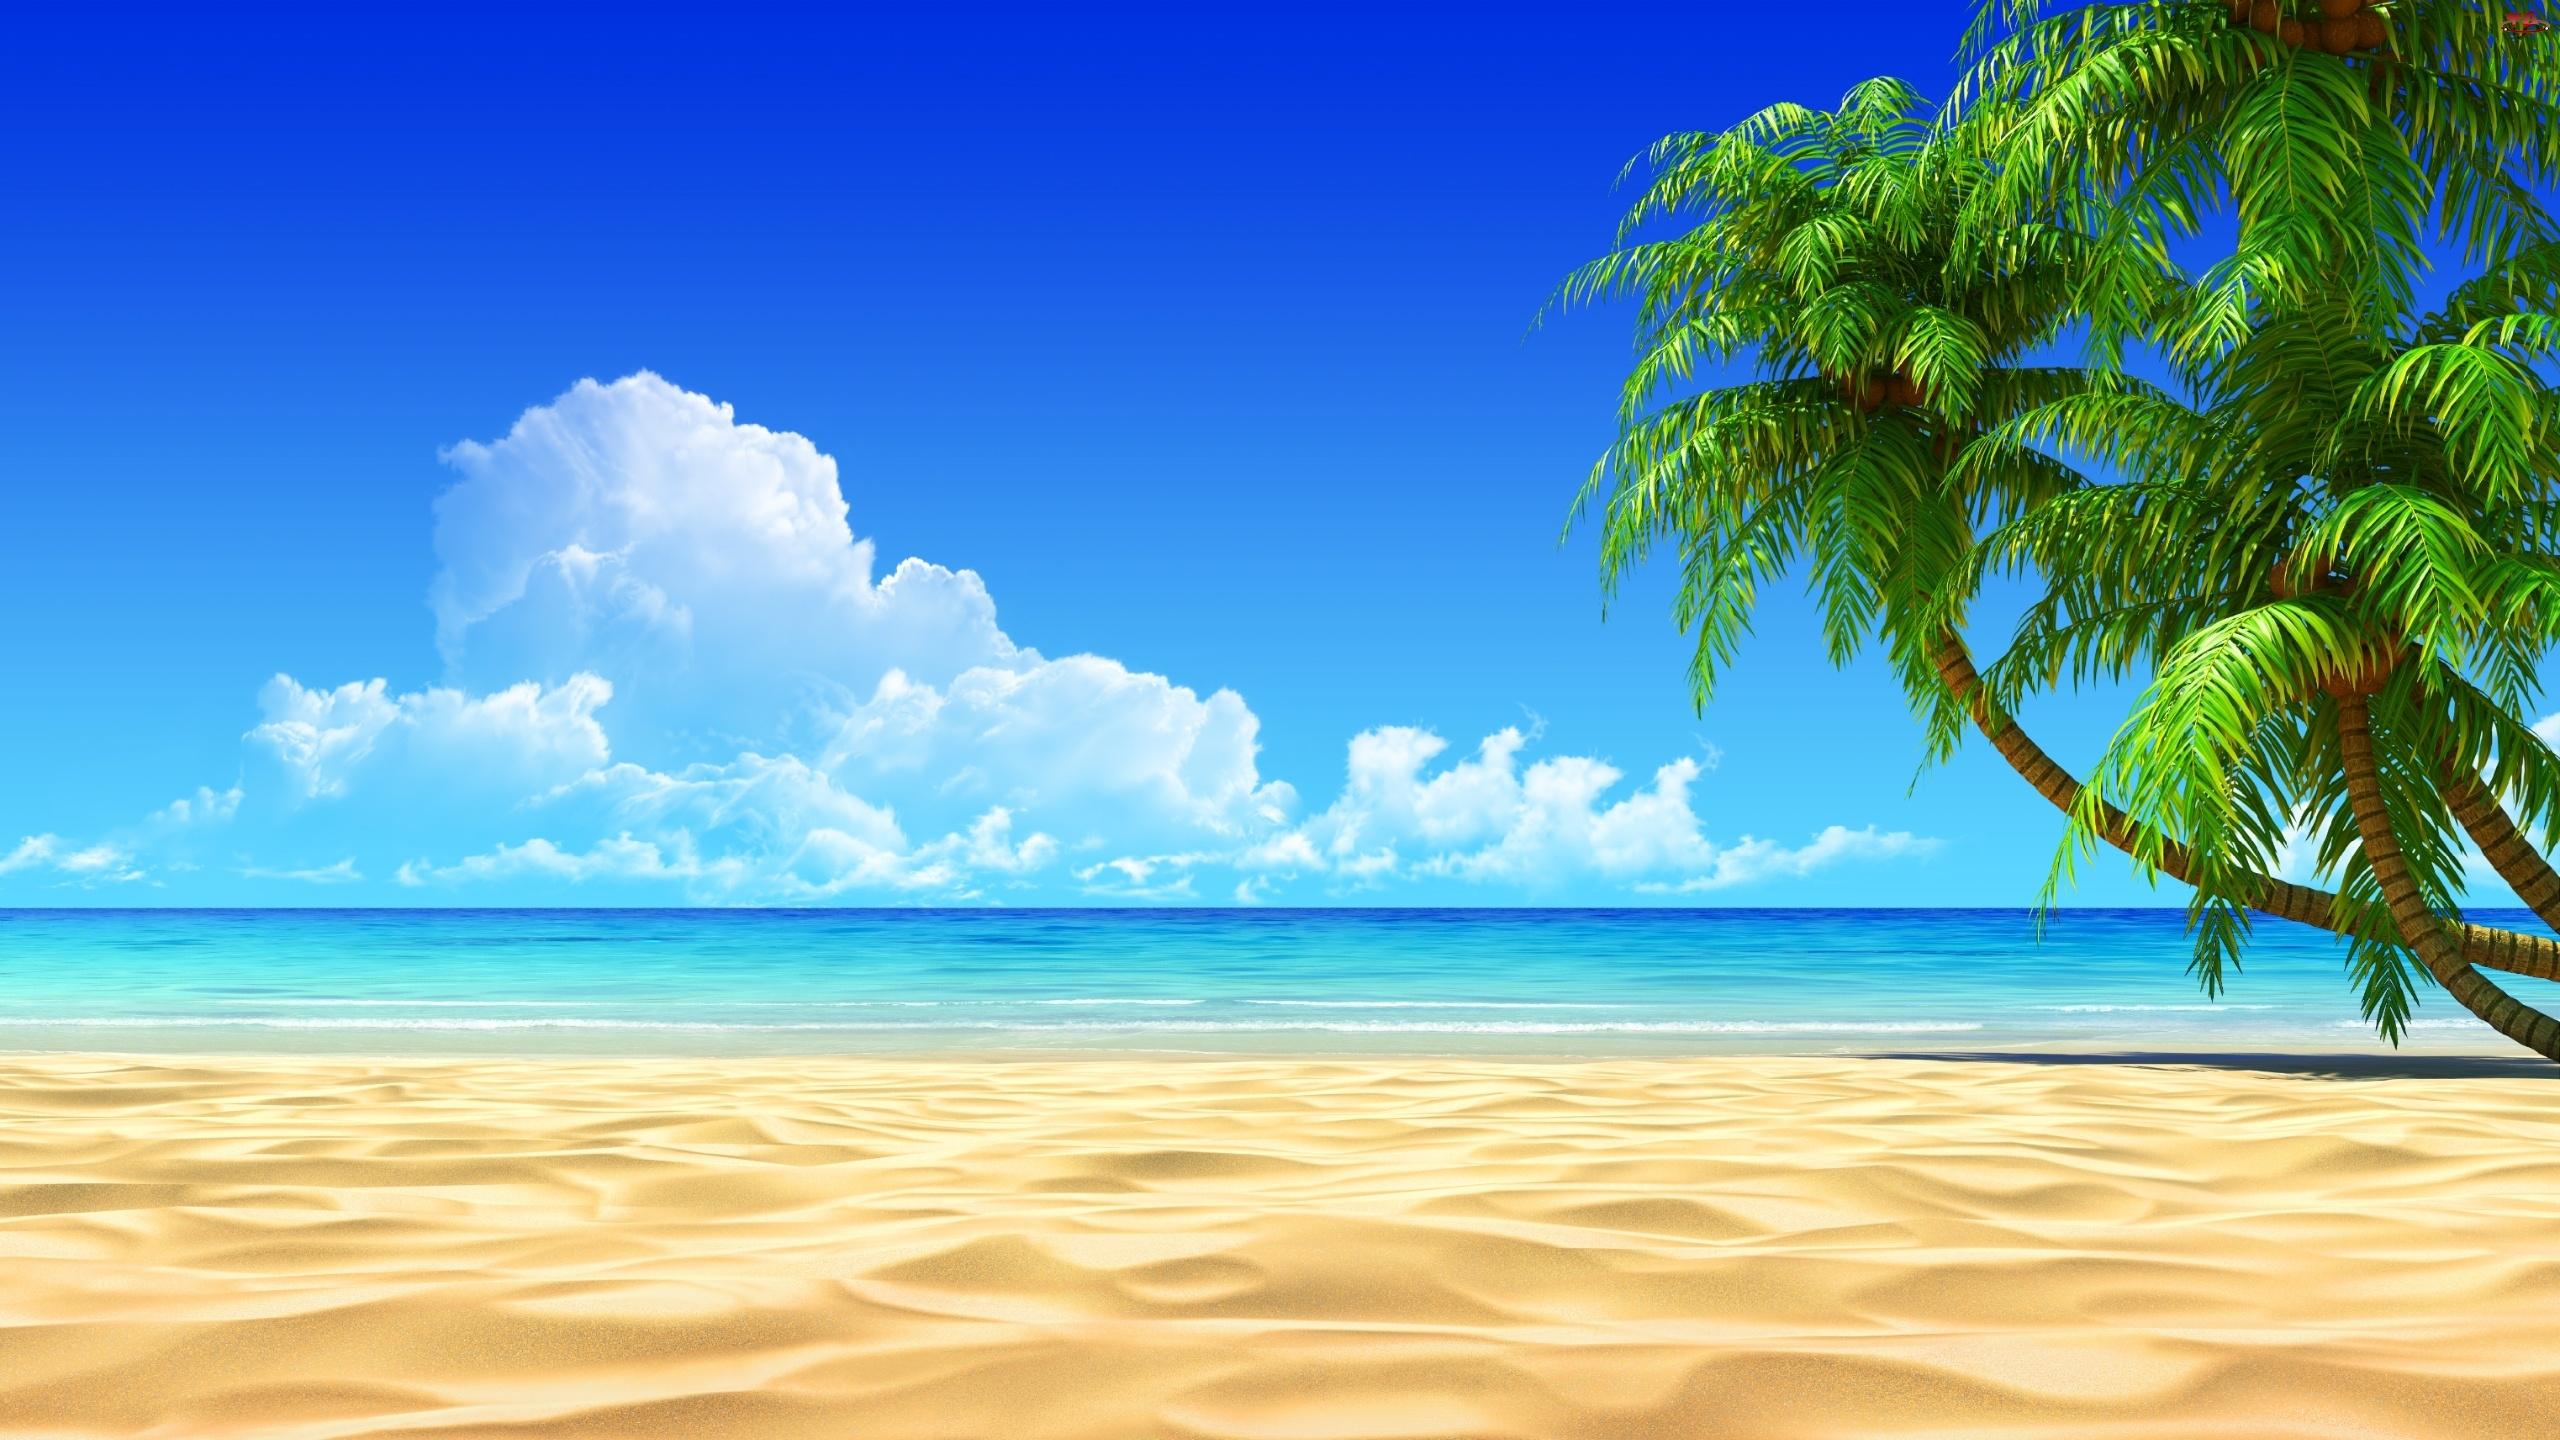 beach hd wallpapers beach hd wallpapers beach hd wallpapers beach 2560x1440